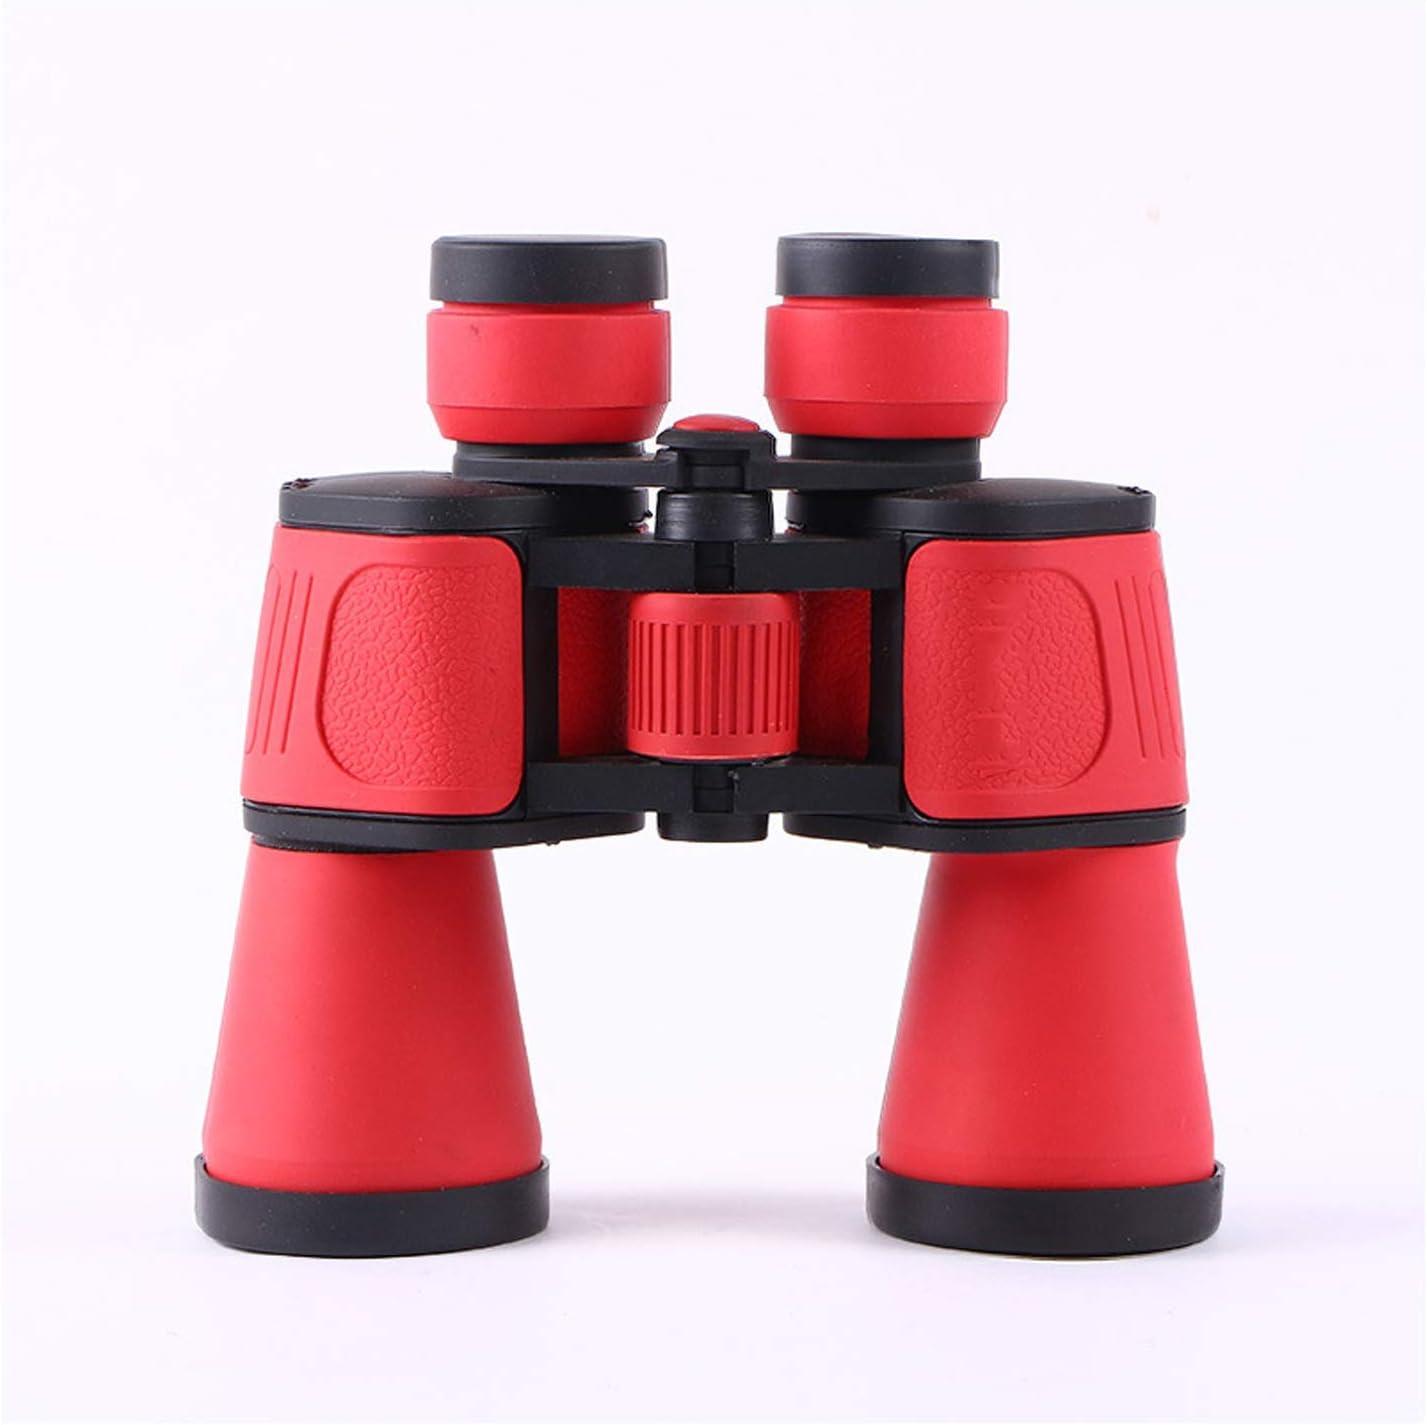 GYCS 10x50 Binoculars store for Adults Kids Power Com Max 51% OFF High